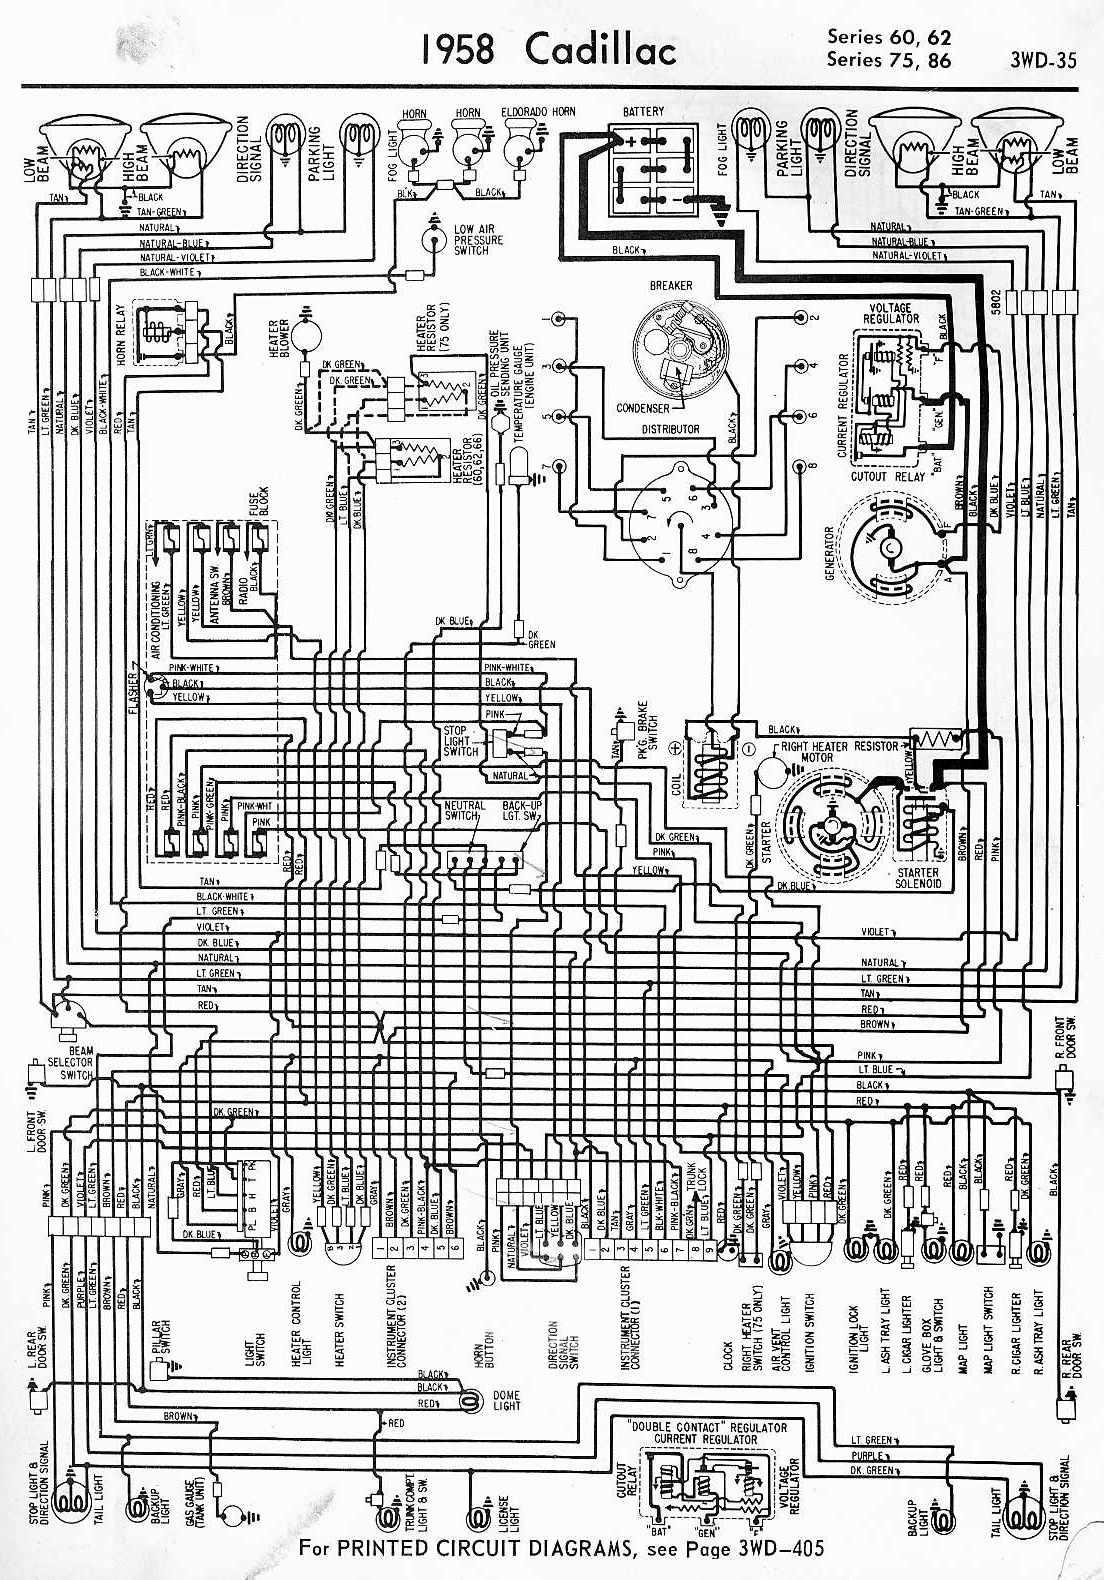 small resolution of 1948 cadillac wiring diagram wiring diagrams schema mustang fuse box 1948 cadillac fuse box